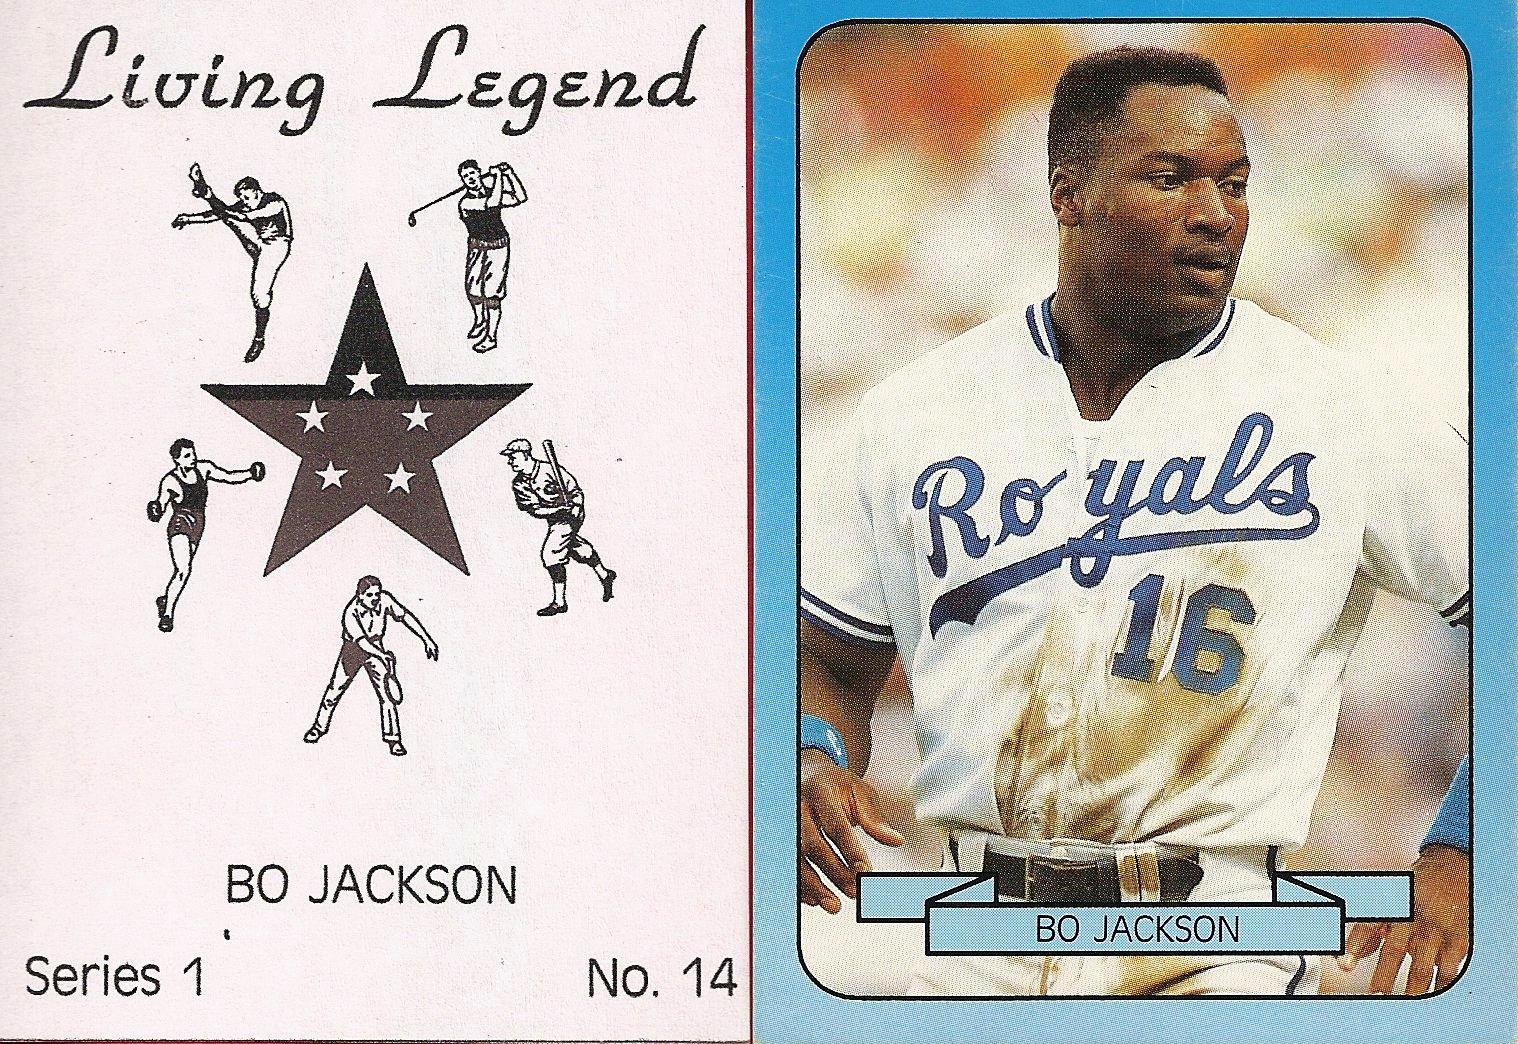 1990 Living Legend Blue Series 1